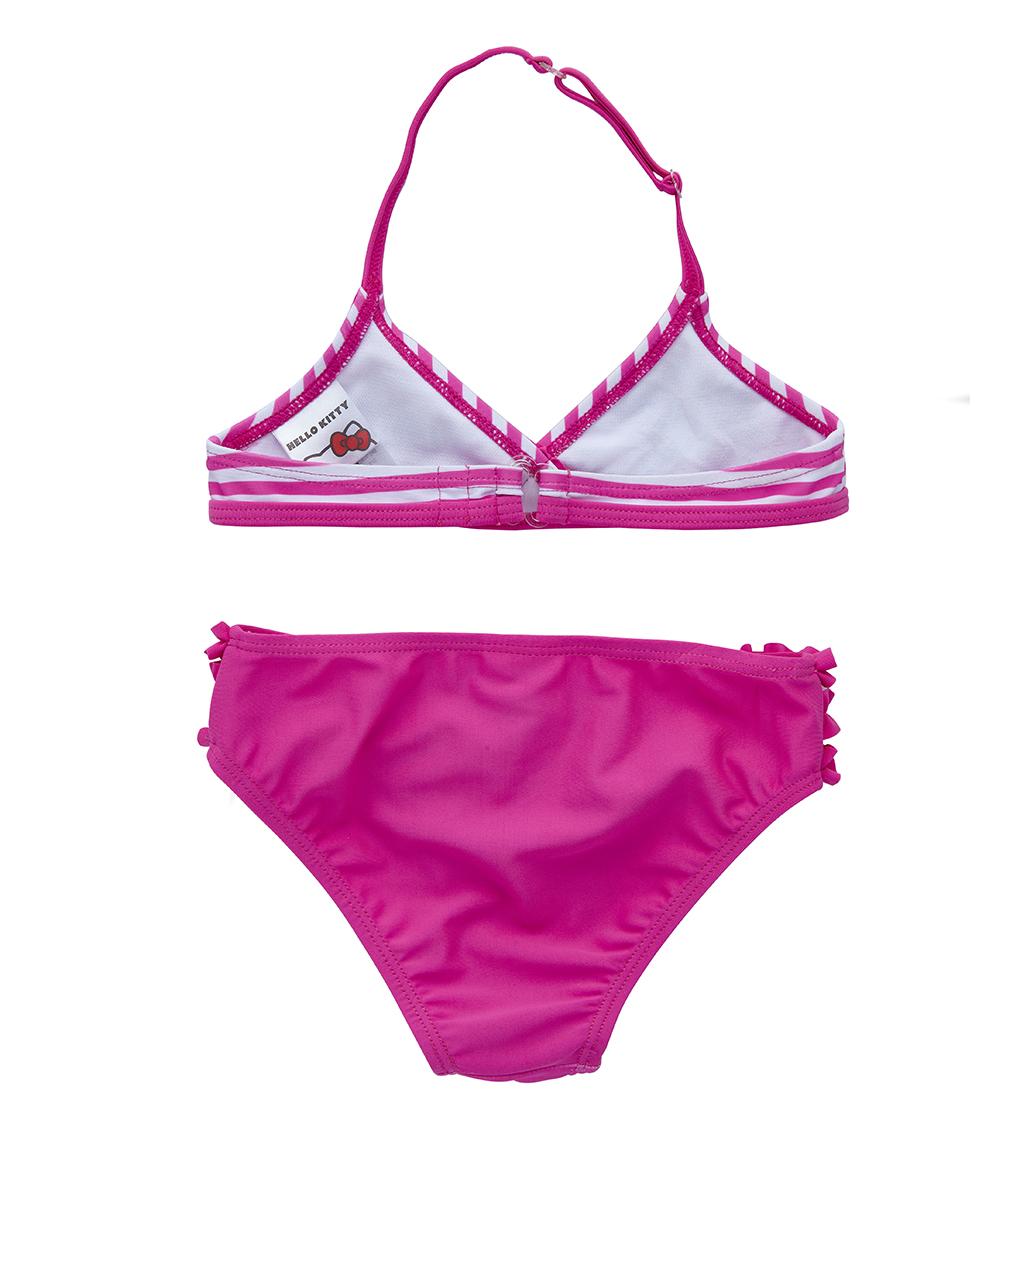 87b72c9ecbdb Bikini Hello Kitty - BAMBINO 3-8, Abbigliamento Bambina, Moda mare ...